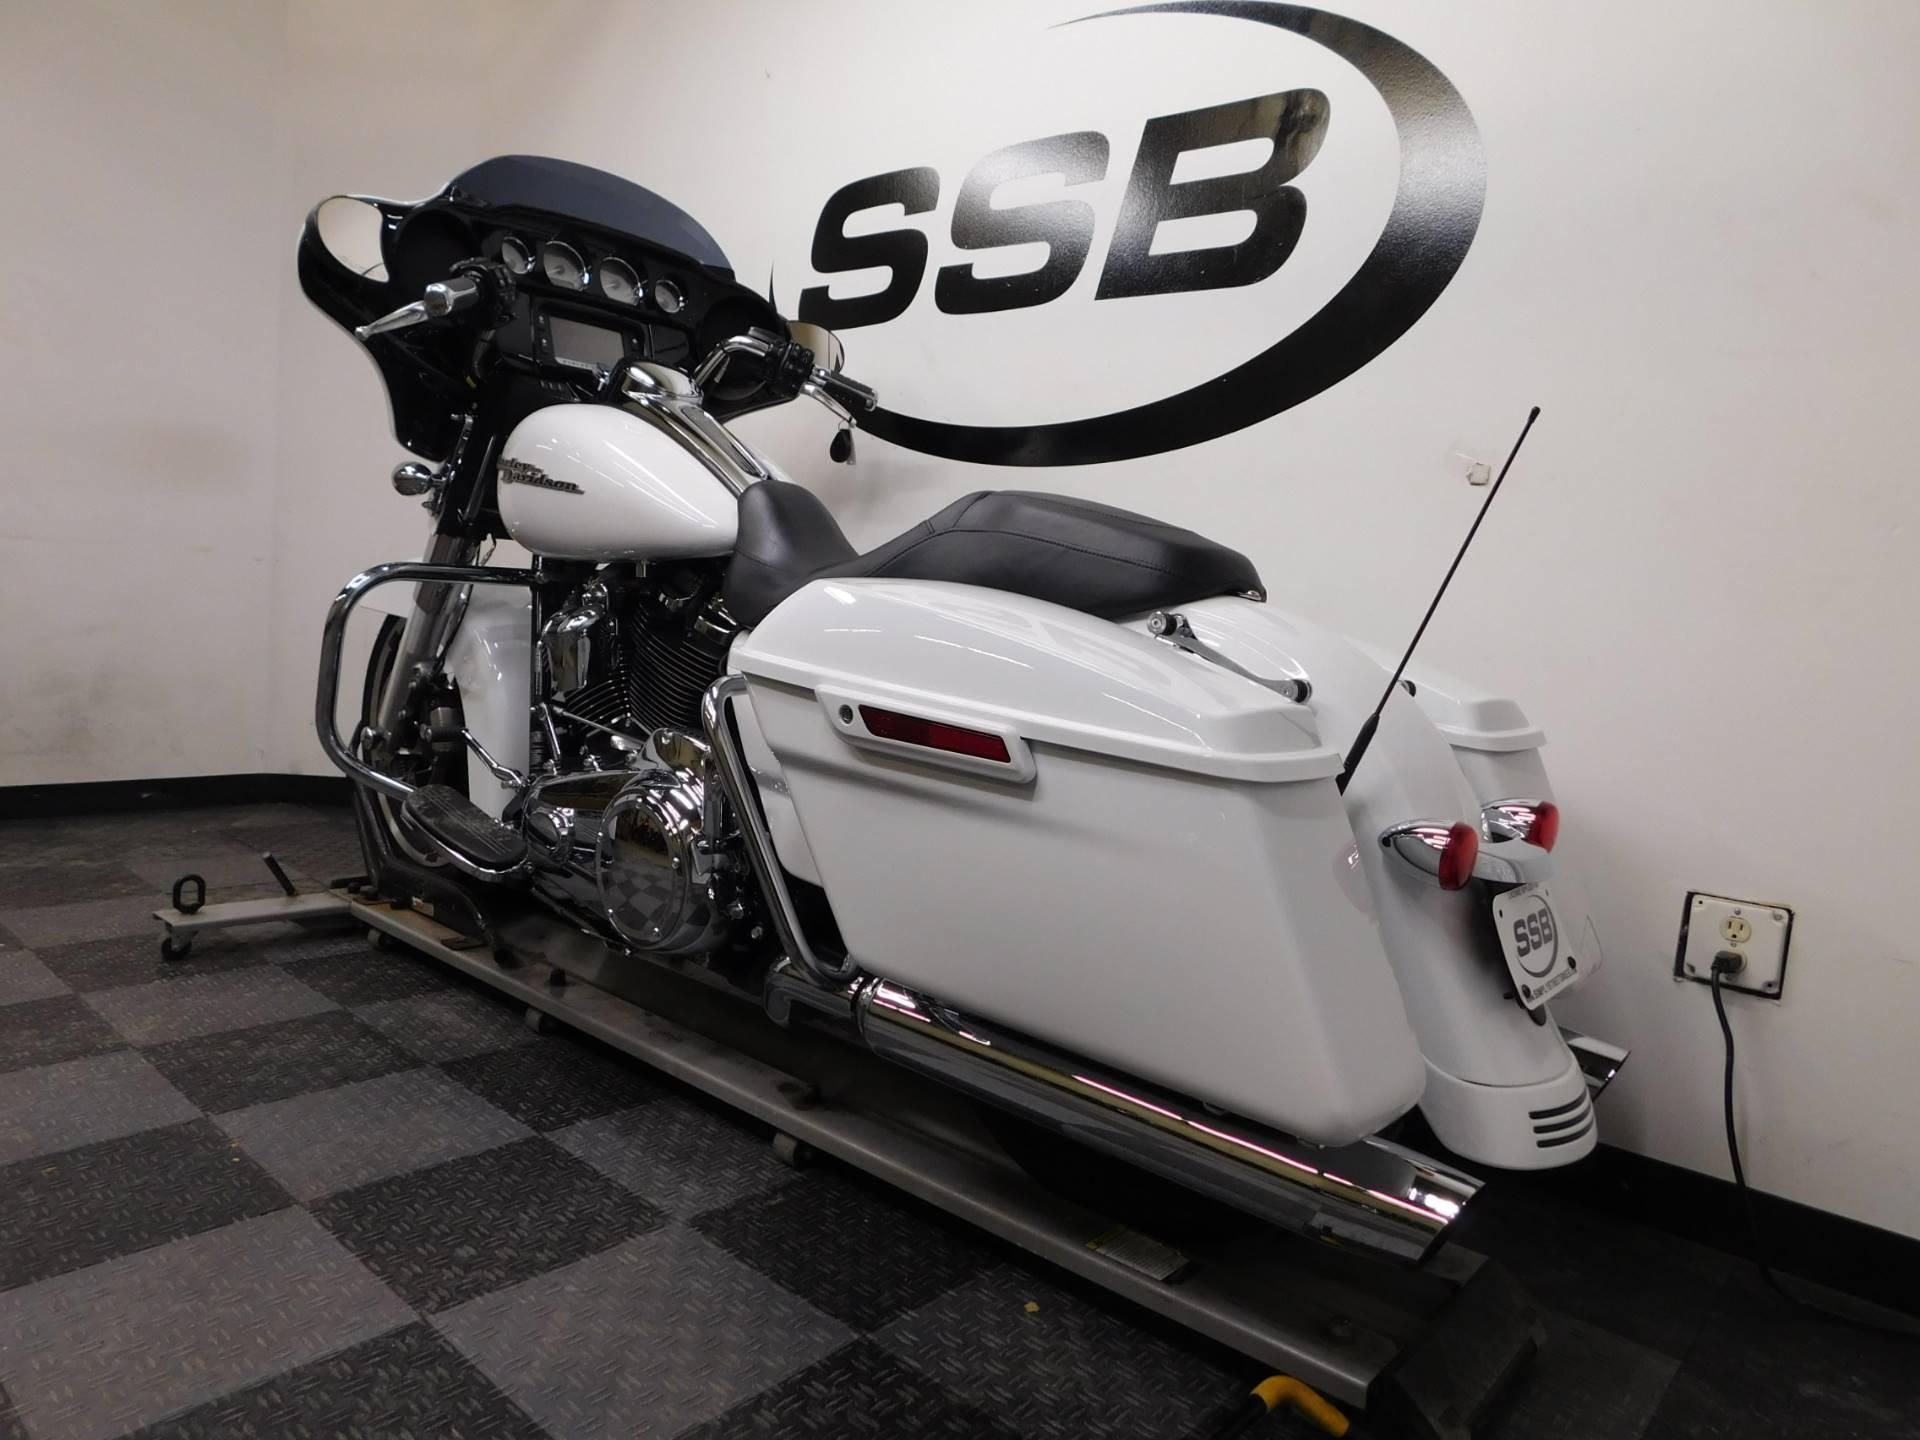 2017 Harley-Davidson Street Glide Special 6